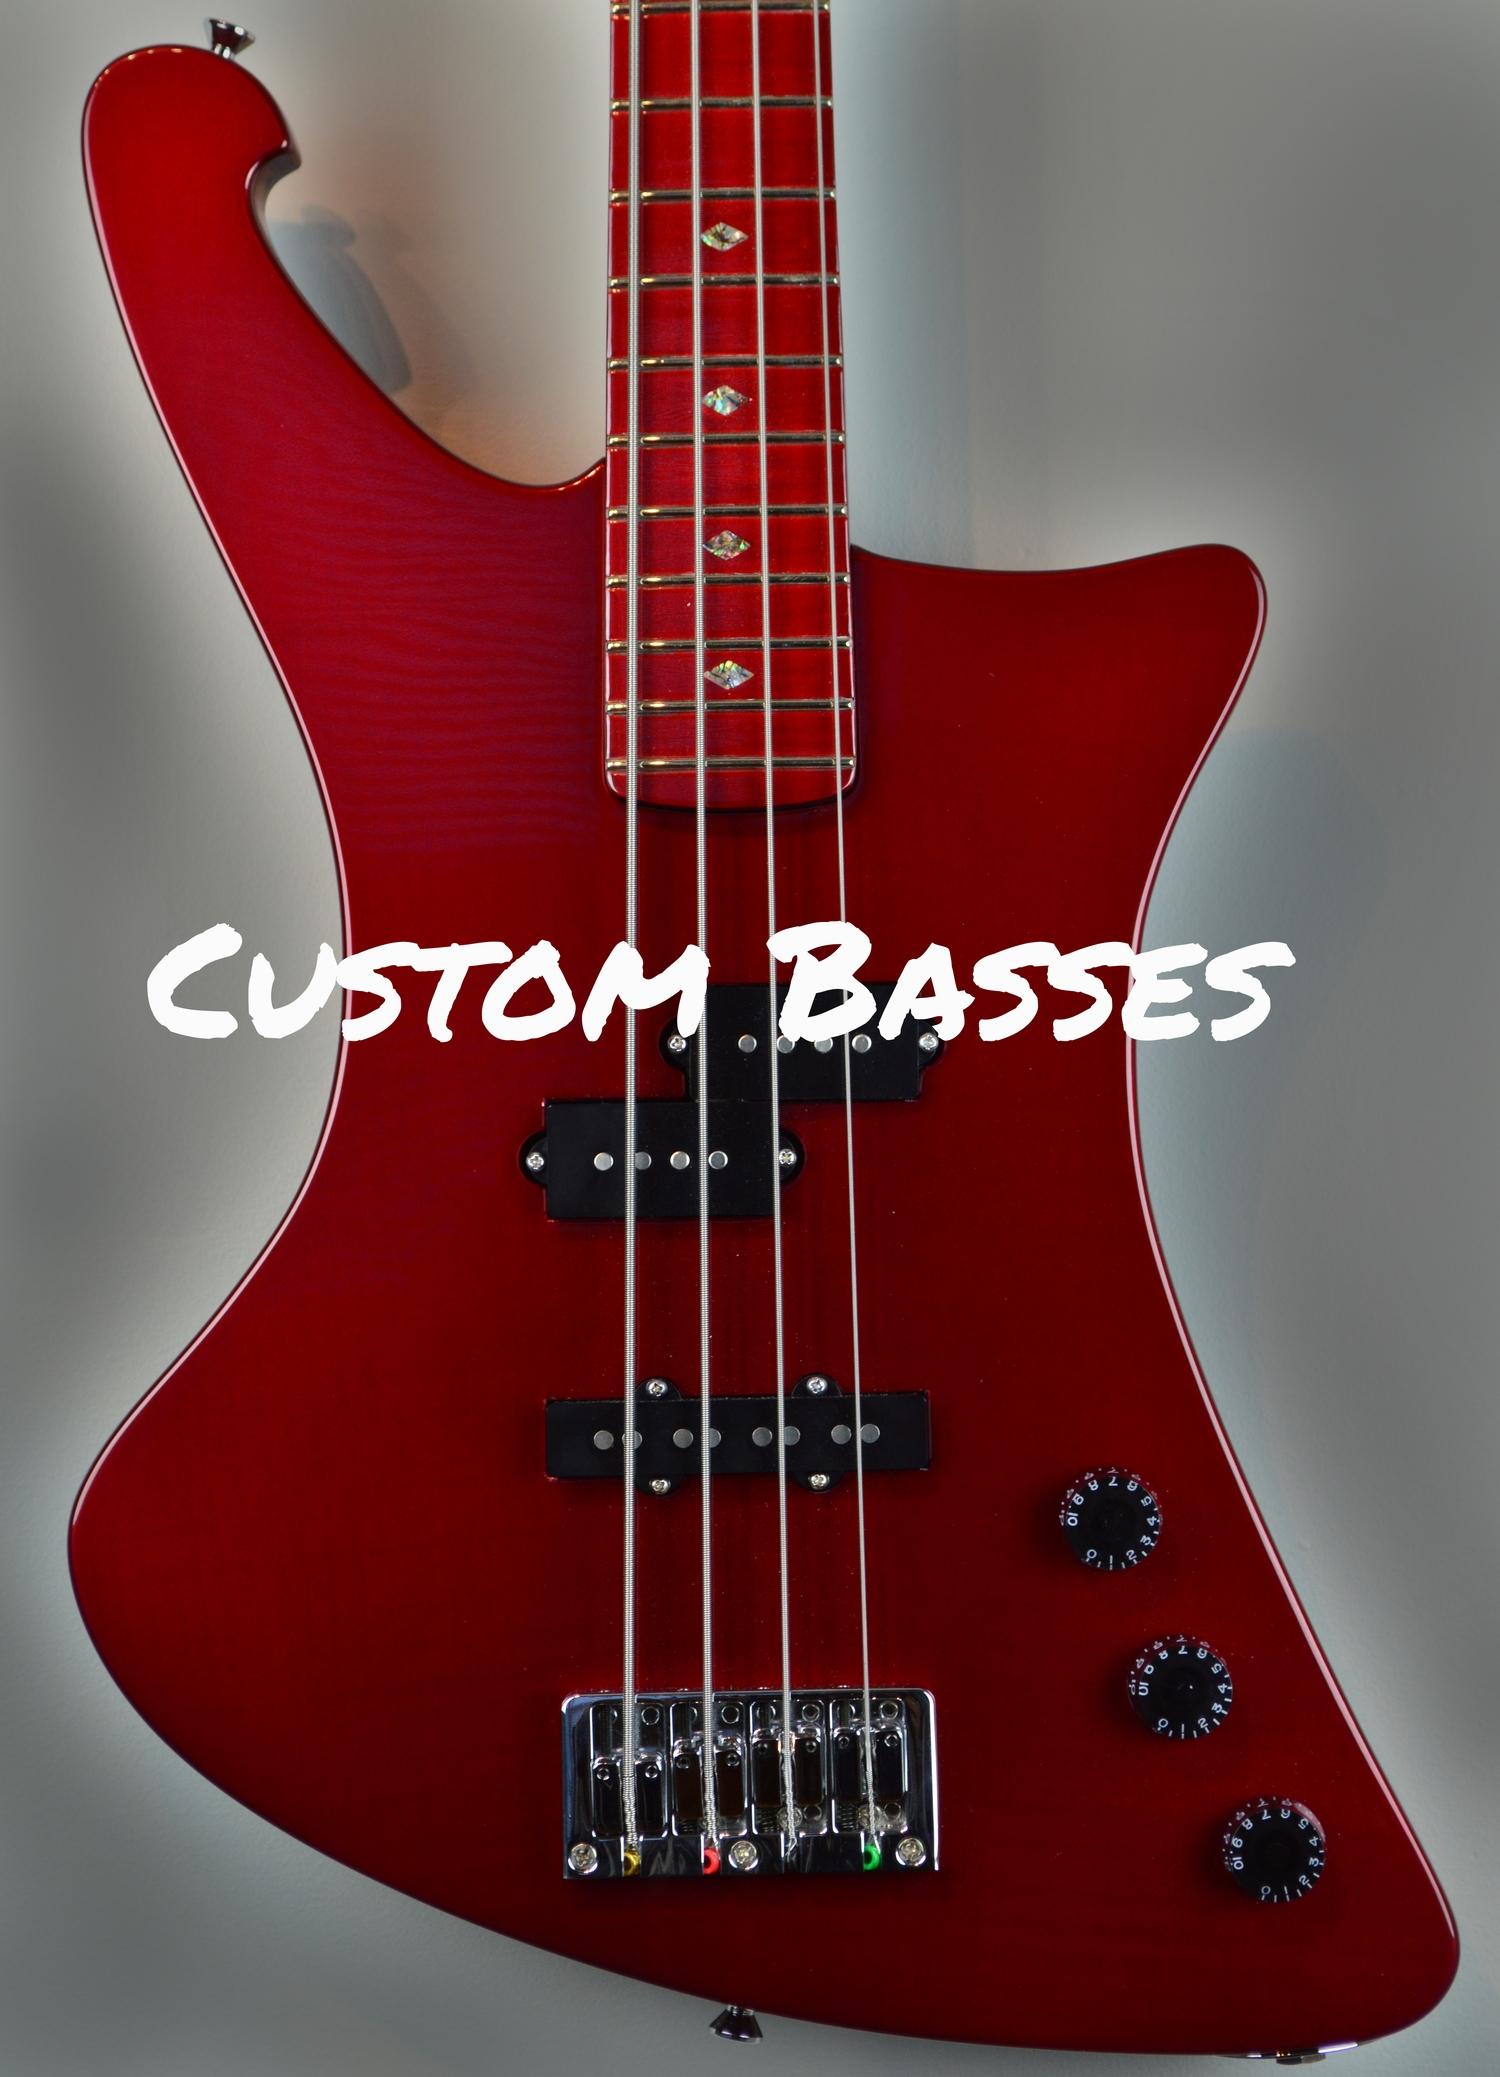 custombasses.jpg